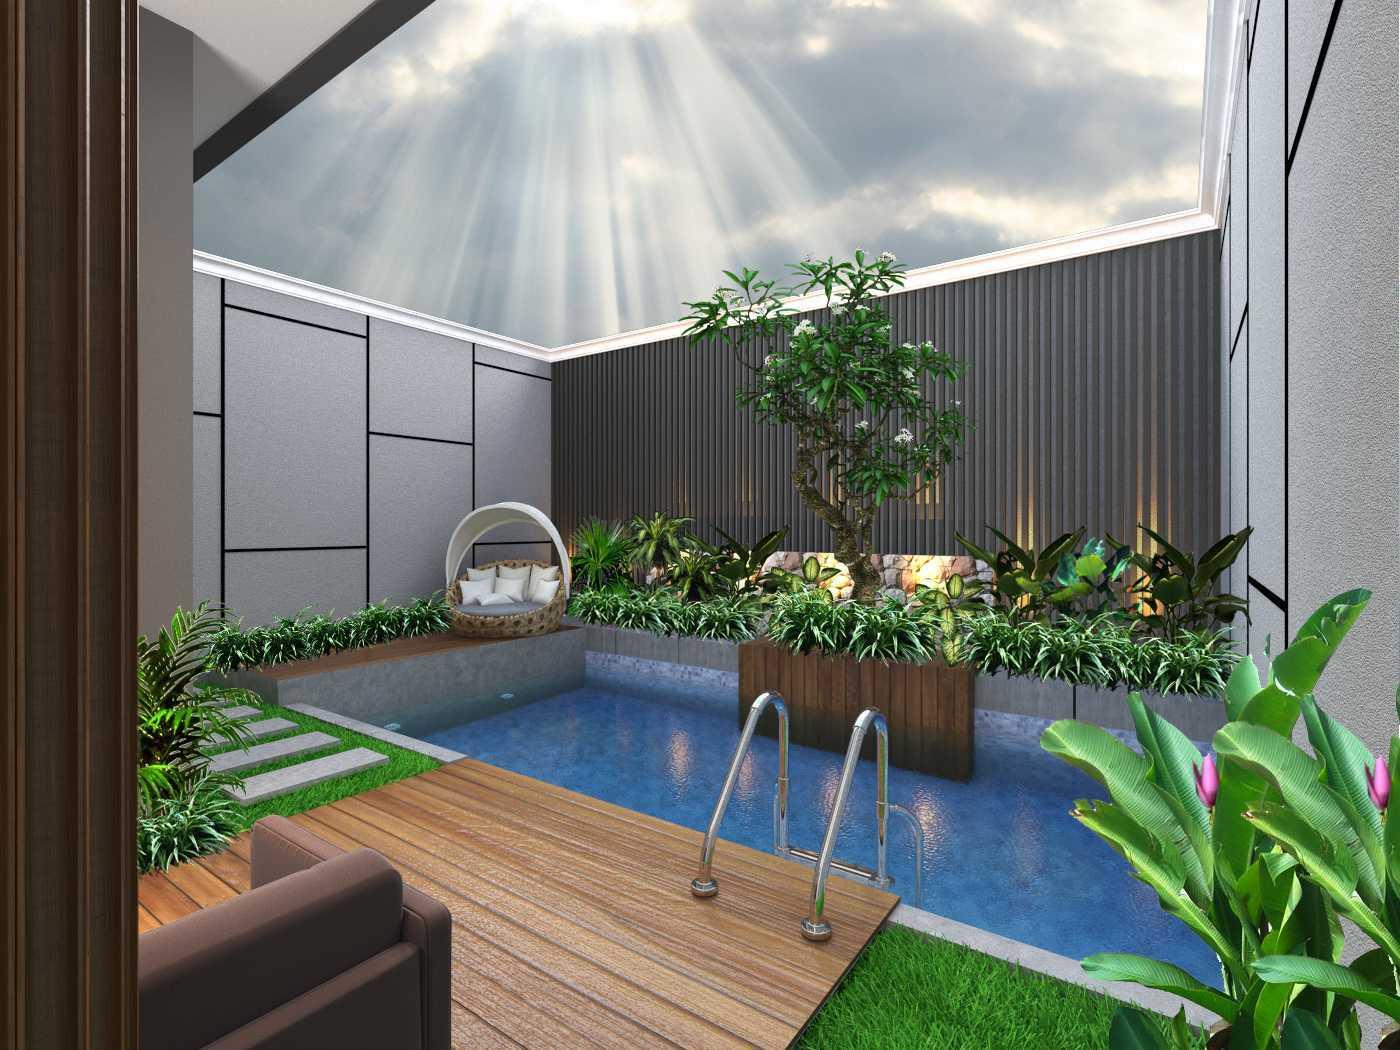 Sense Studio Residence - Surabaya Surabaya, Kota Sby, Jawa Timur, Indonesia Surabaya, Kota Sby, Jawa Timur, Indonesia Sense-Studio-Rumah-Tinggal-Kertomenanggal  51656